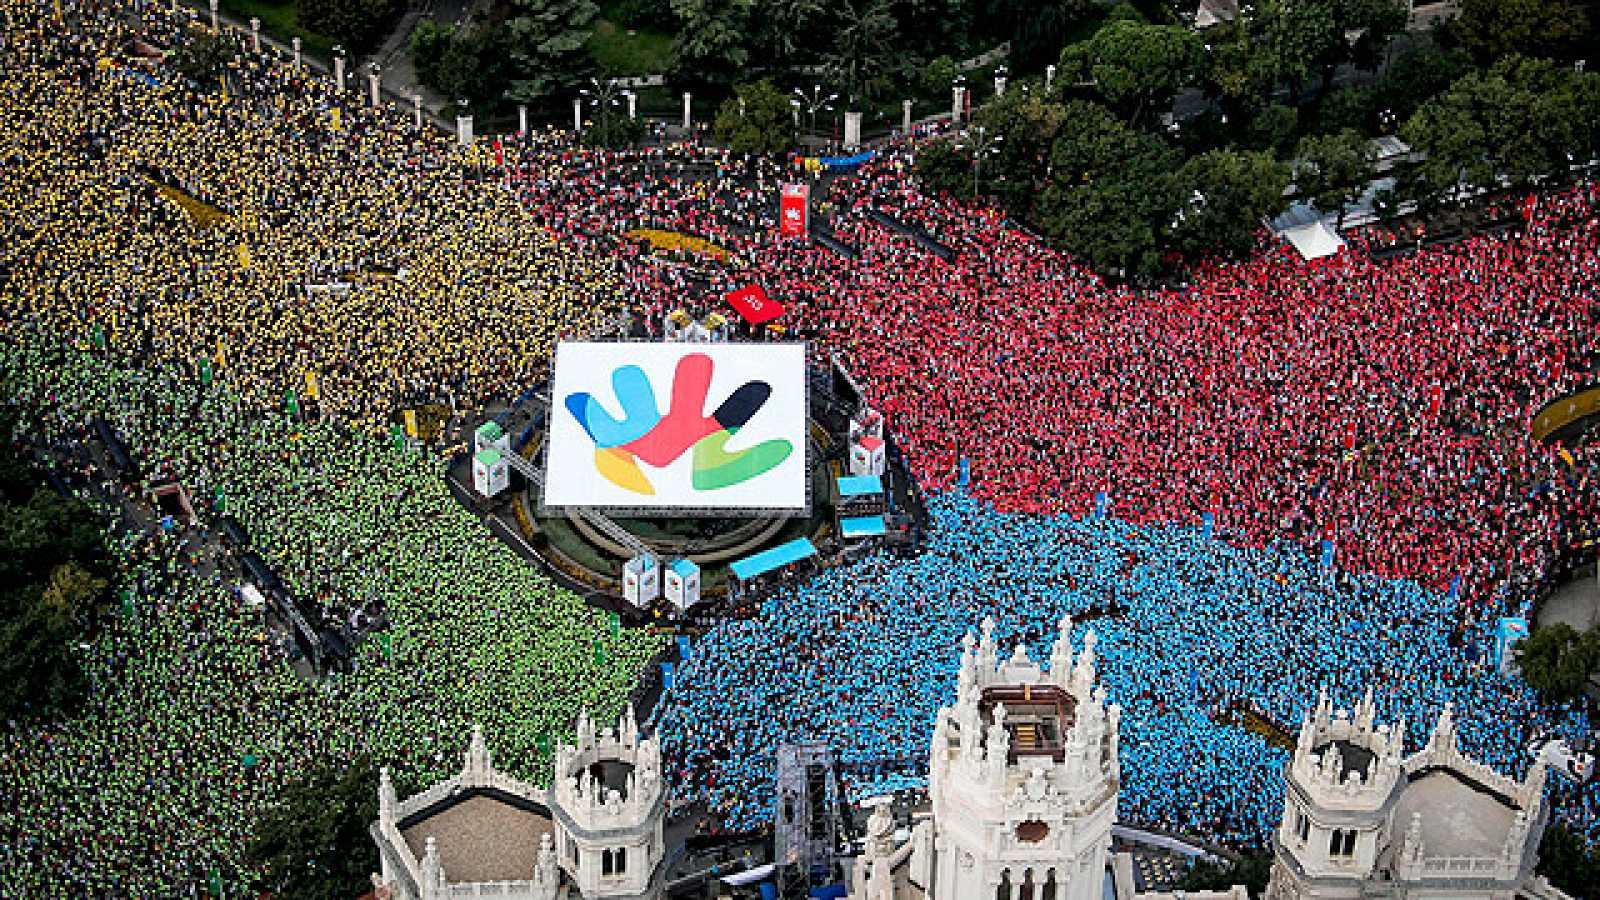 candidatura madrid juegos olimpicos 2016